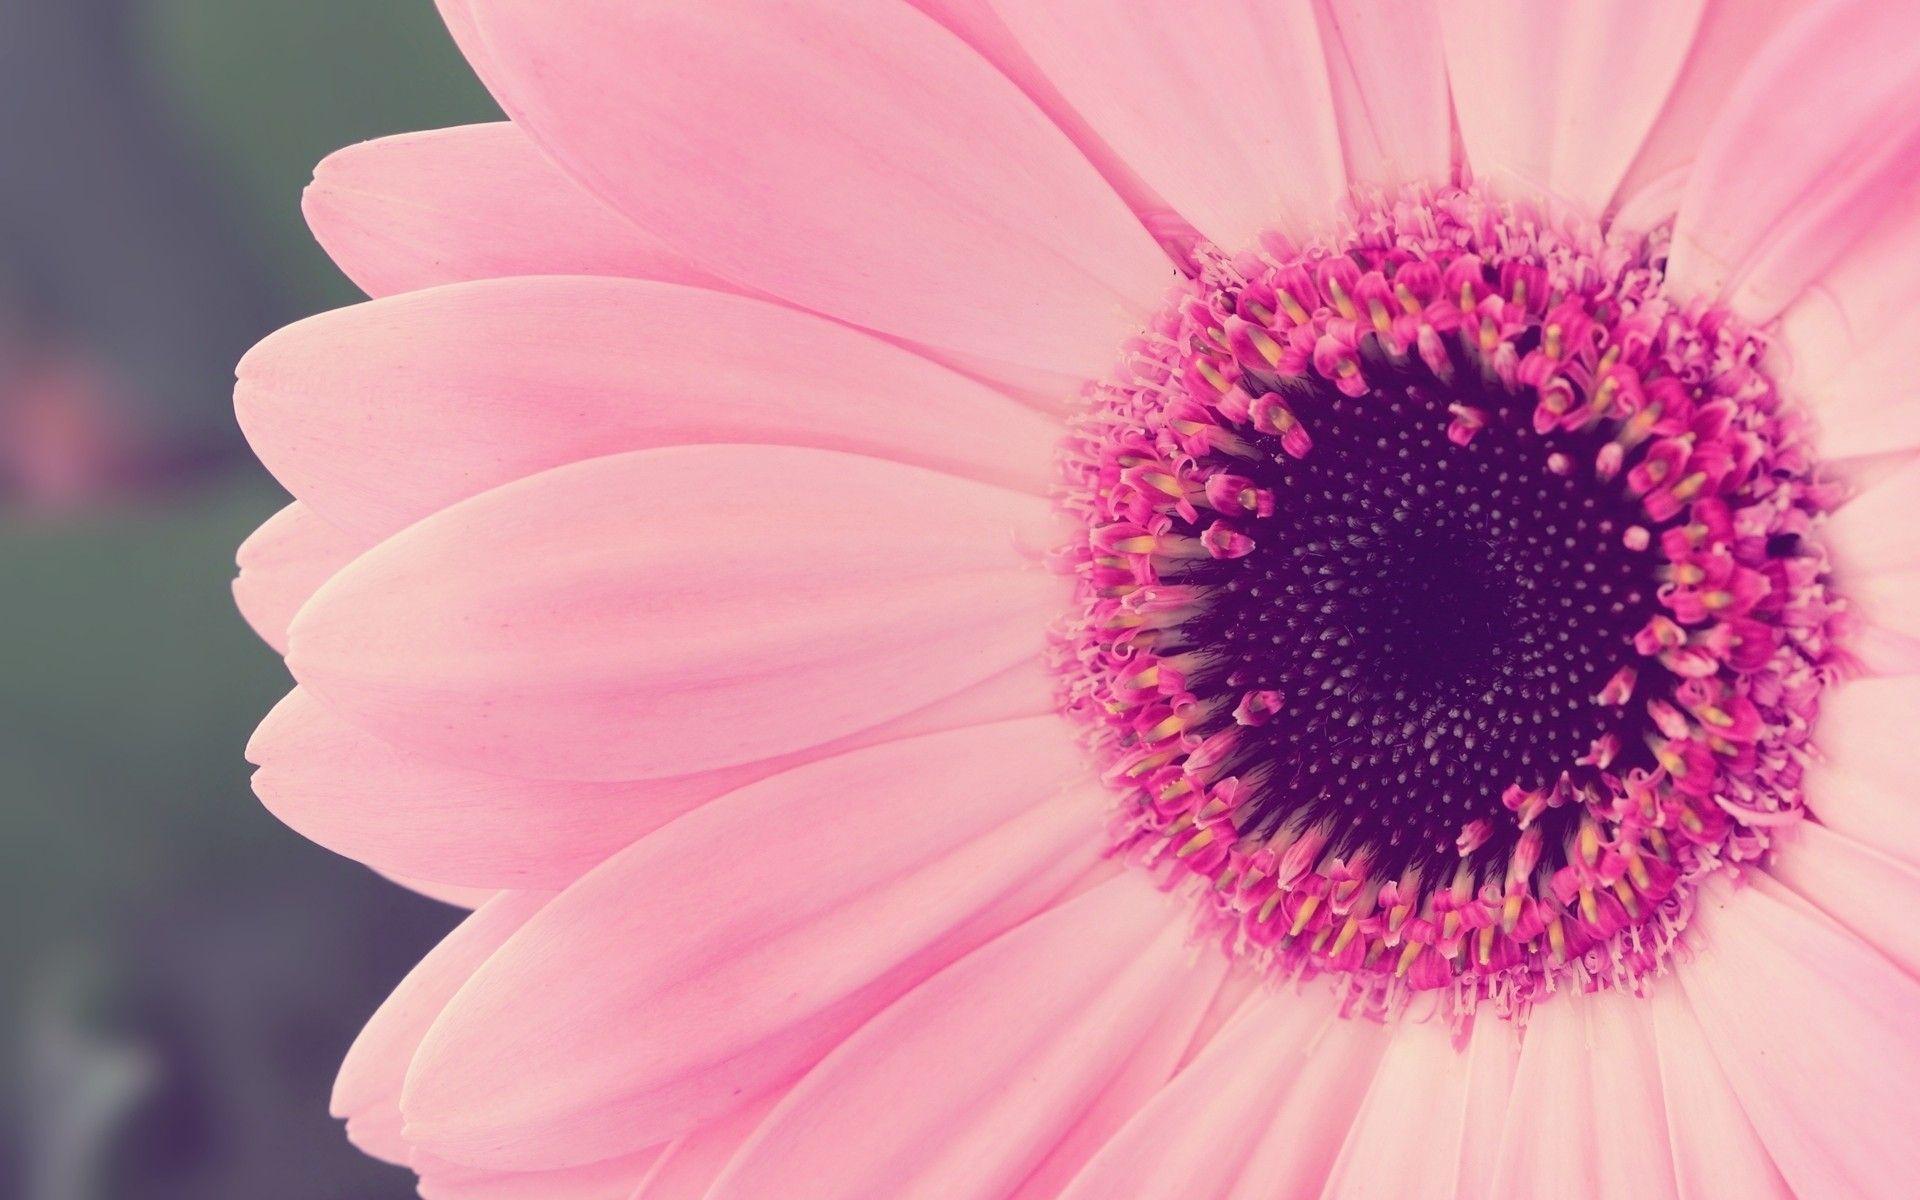 Flower Pink flowers wallpaper, Flower desktop wallpaper